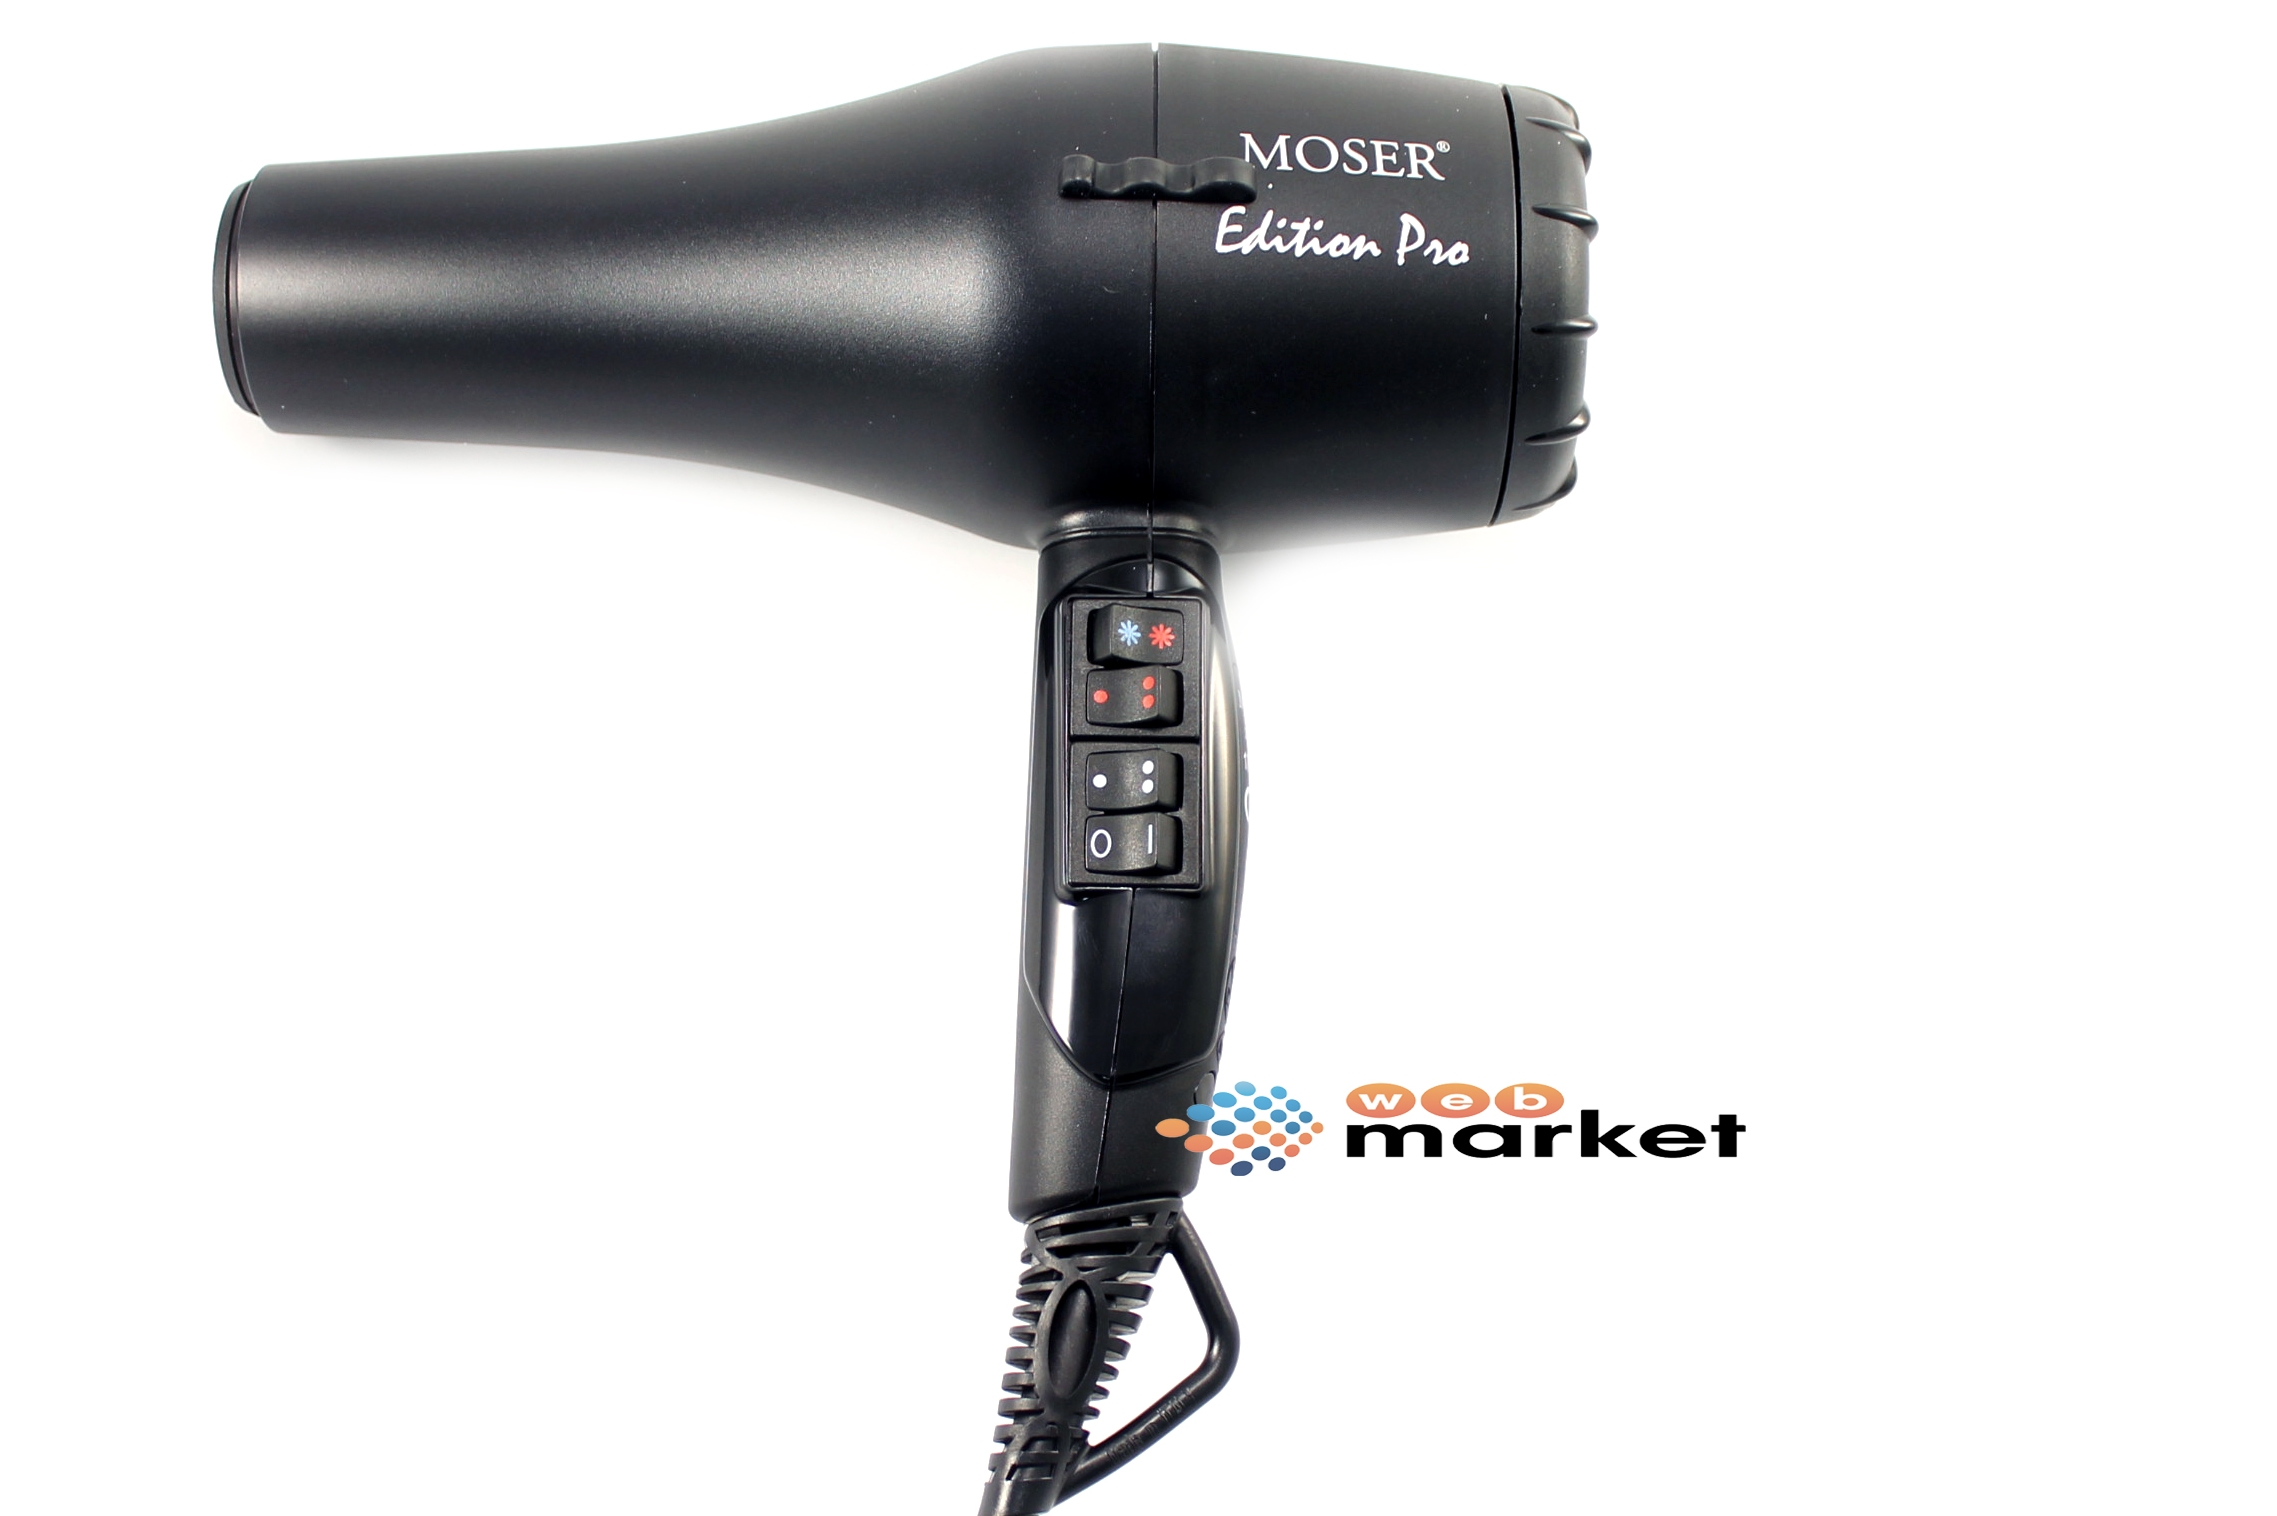 Фен Moser 4320-0050 2000 чёрный